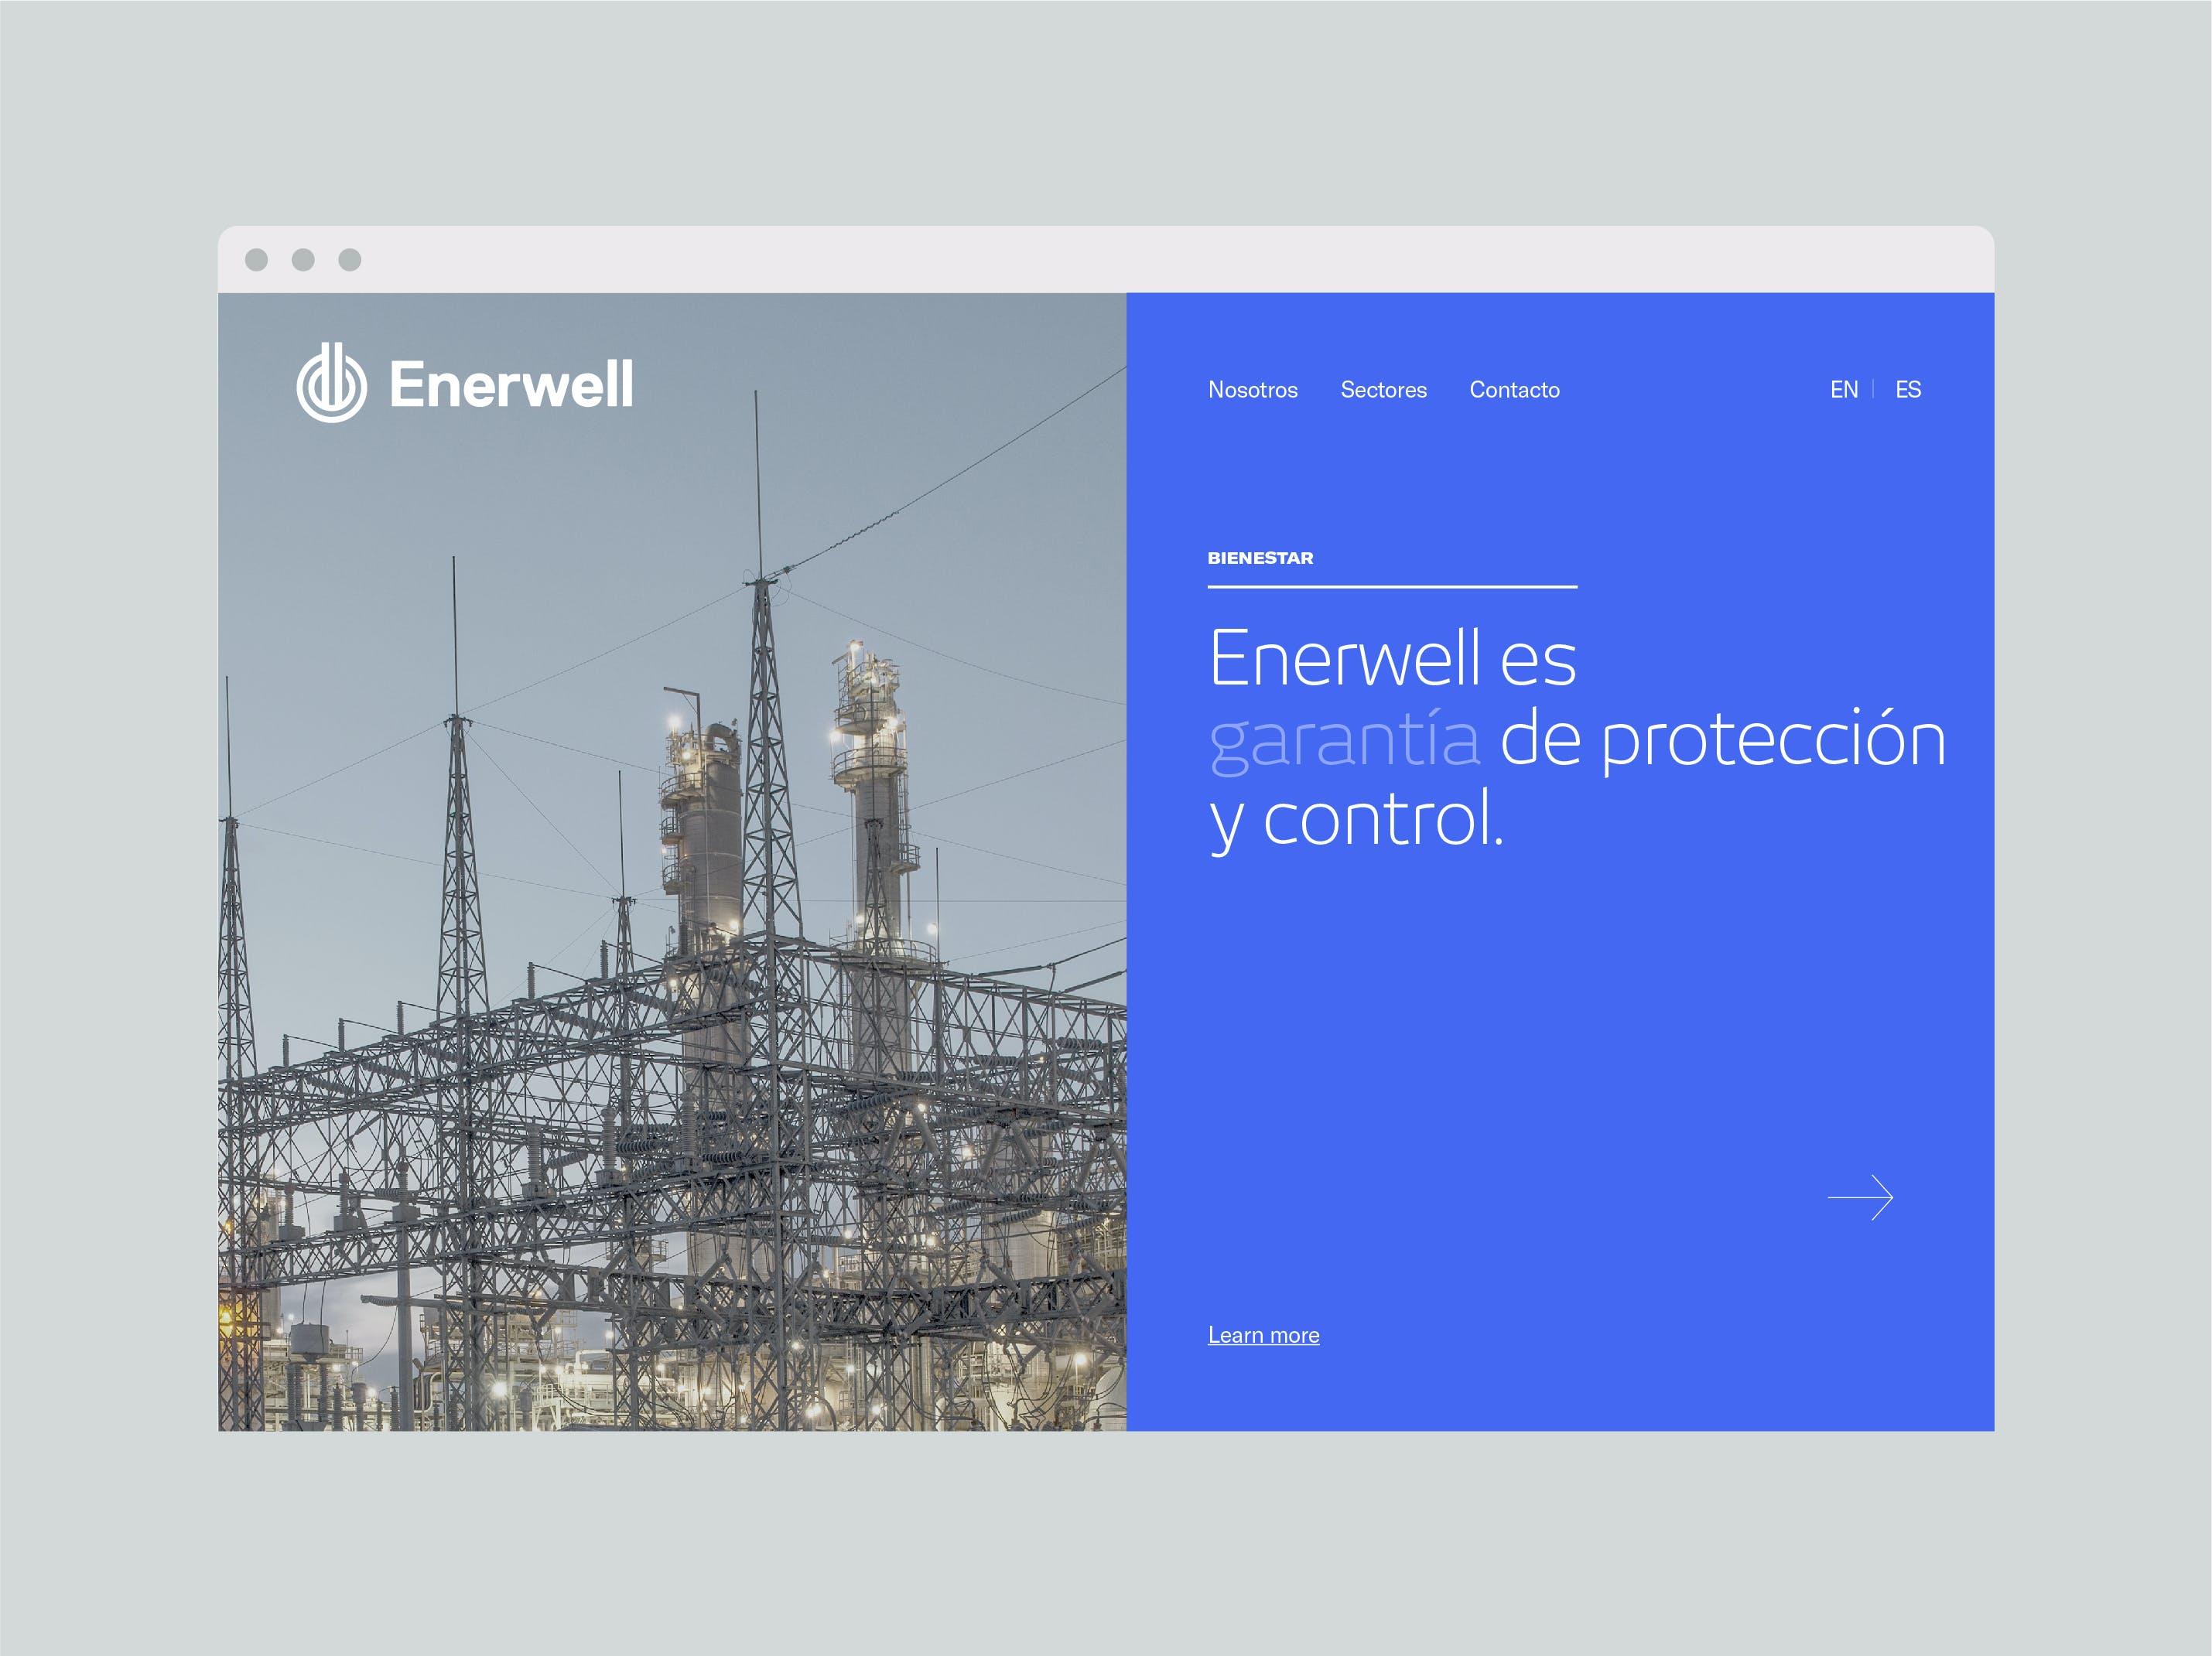 Enerwell